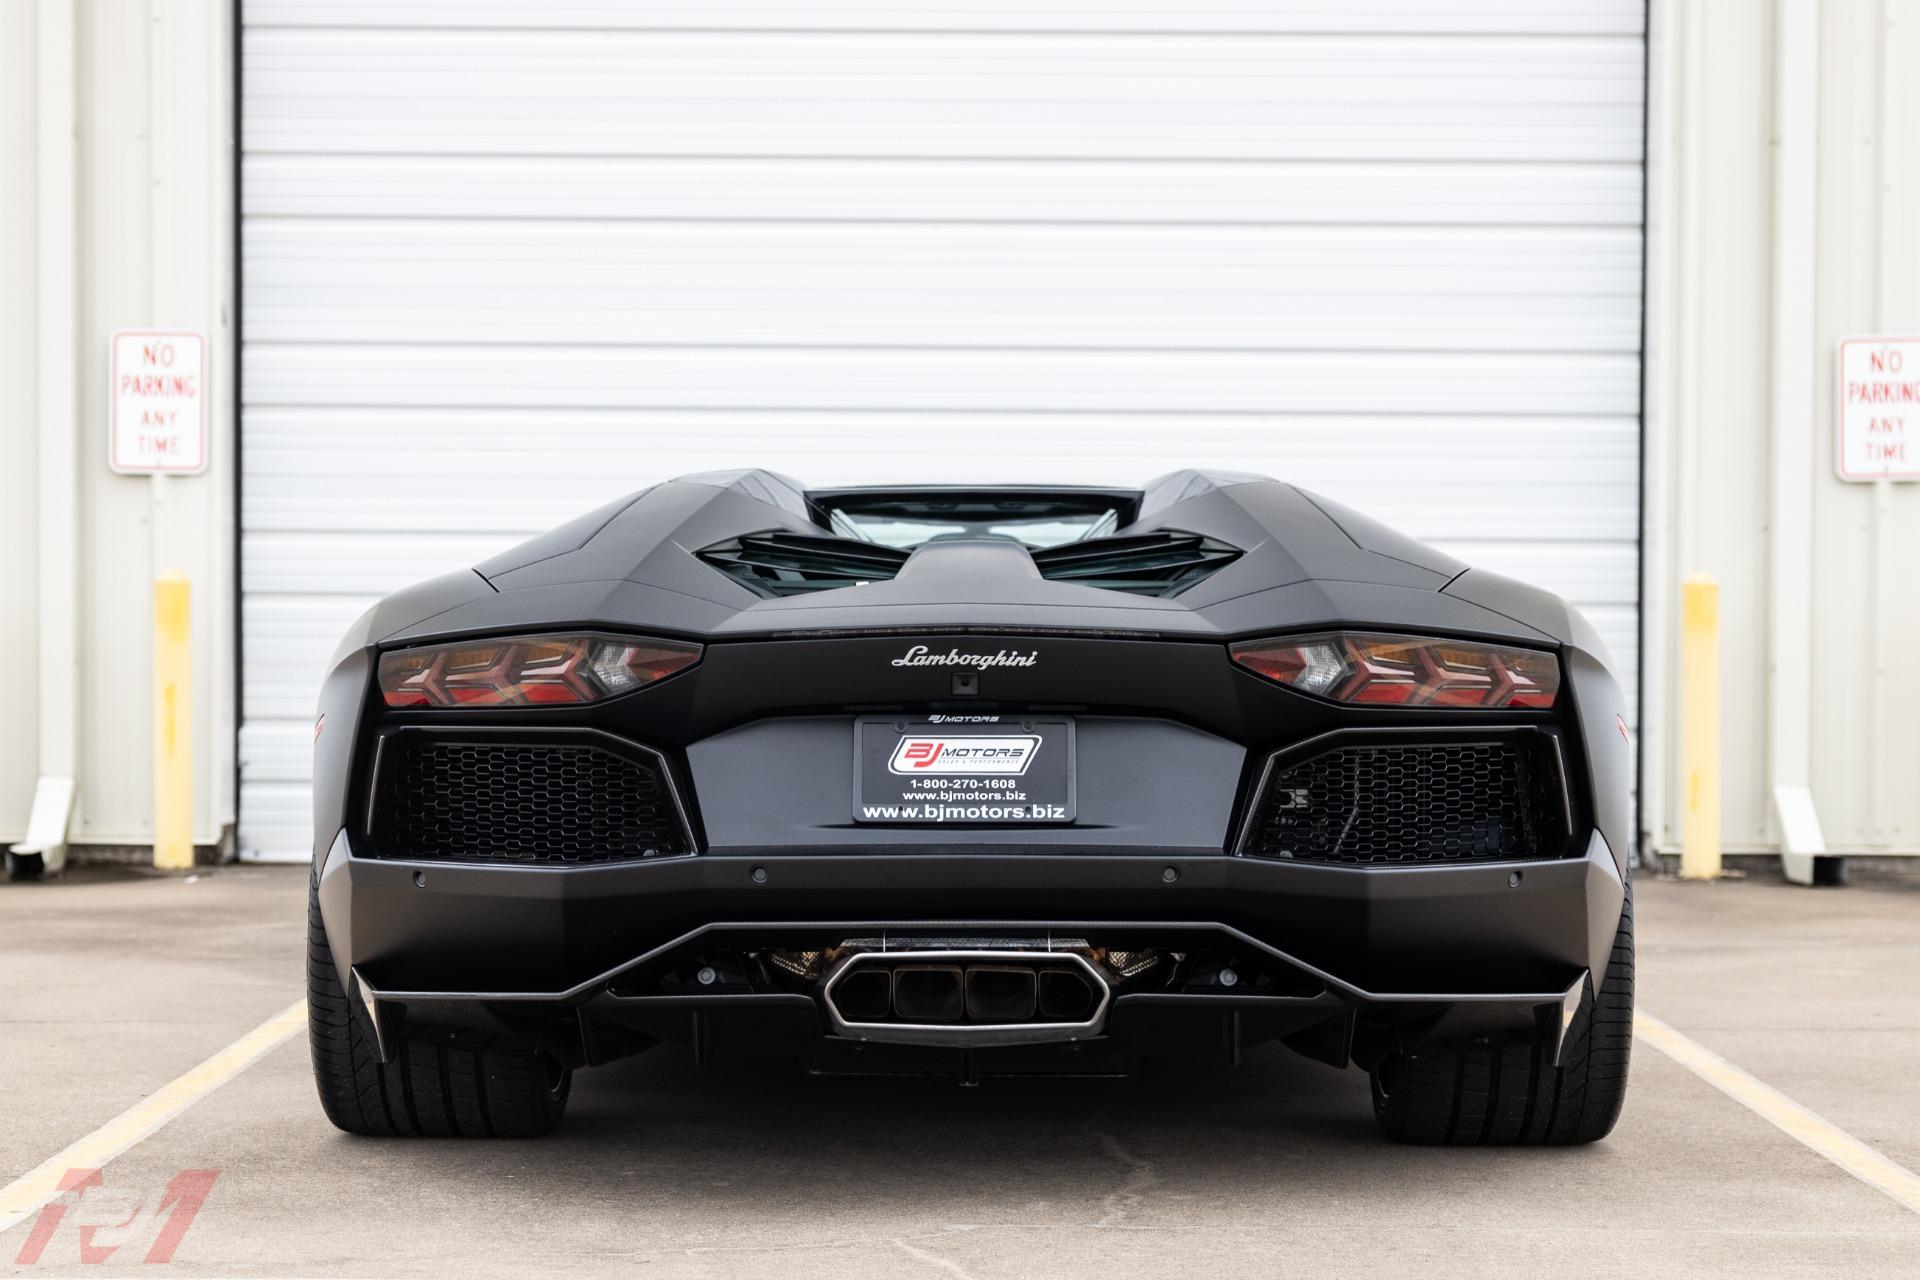 Used-2014-Lamborghini-Aventador-LP-700-4-Roadster